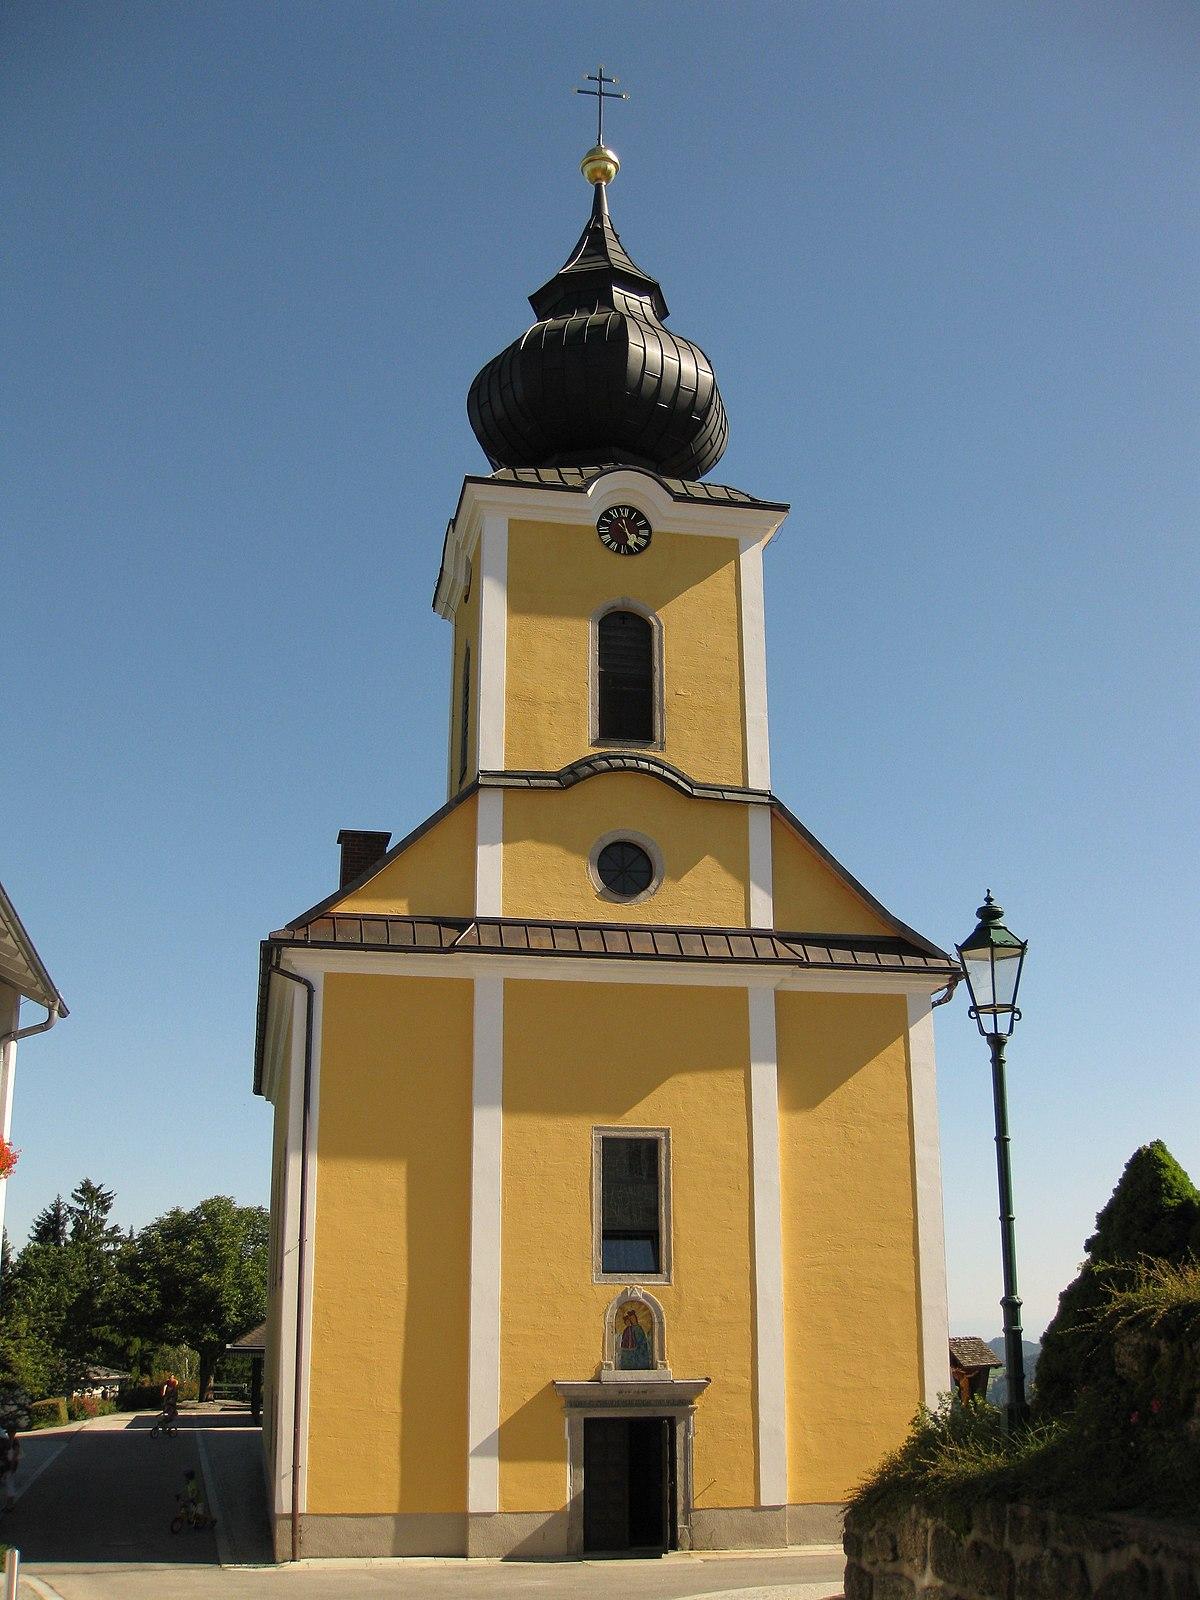 Pfarr Und Wallfahrtskirche Kaltenberg Wikipedia